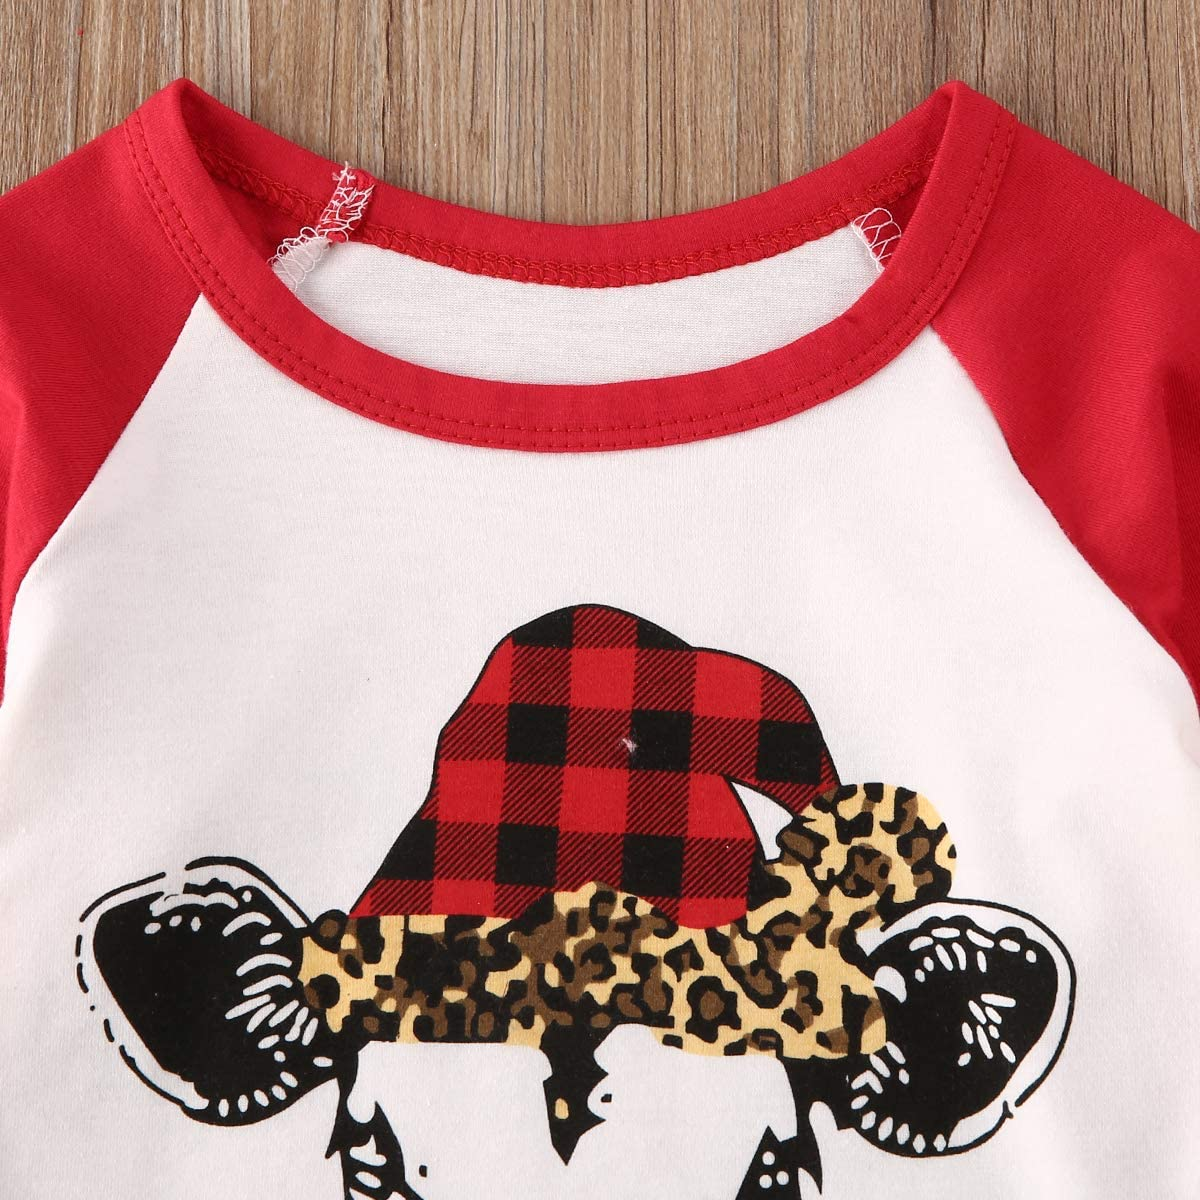 Leopard Flare Pants Sets Denim Bell Bottom Jeans Baby Girls Summer Clothes Letter Print Short Sleeves Romper Tops